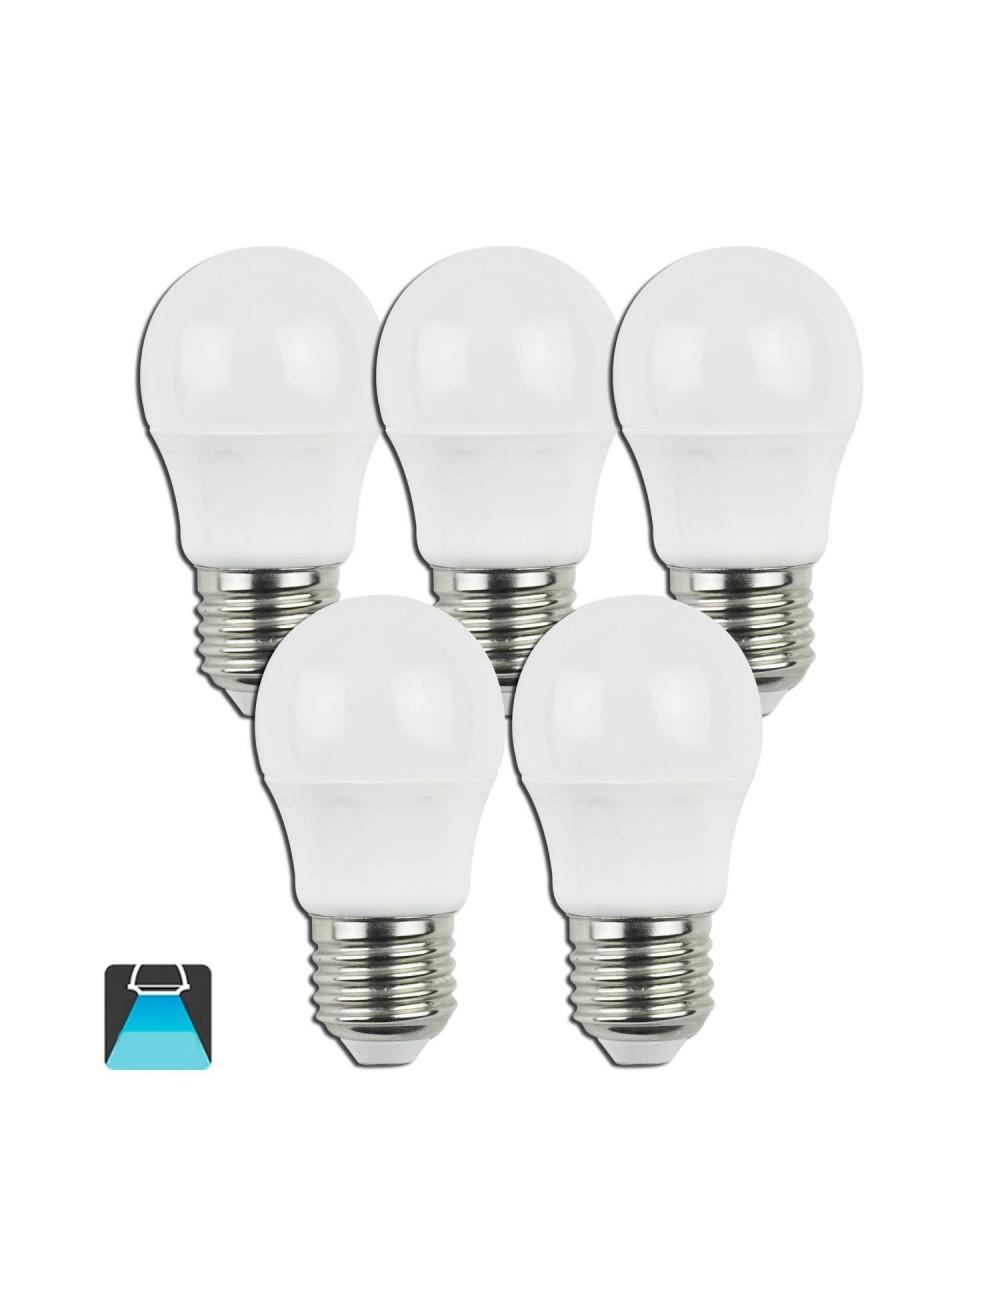 Lampadine led g45 pallina e27 5w 5 pz equivalenti a 45w for Lampadine led lumen